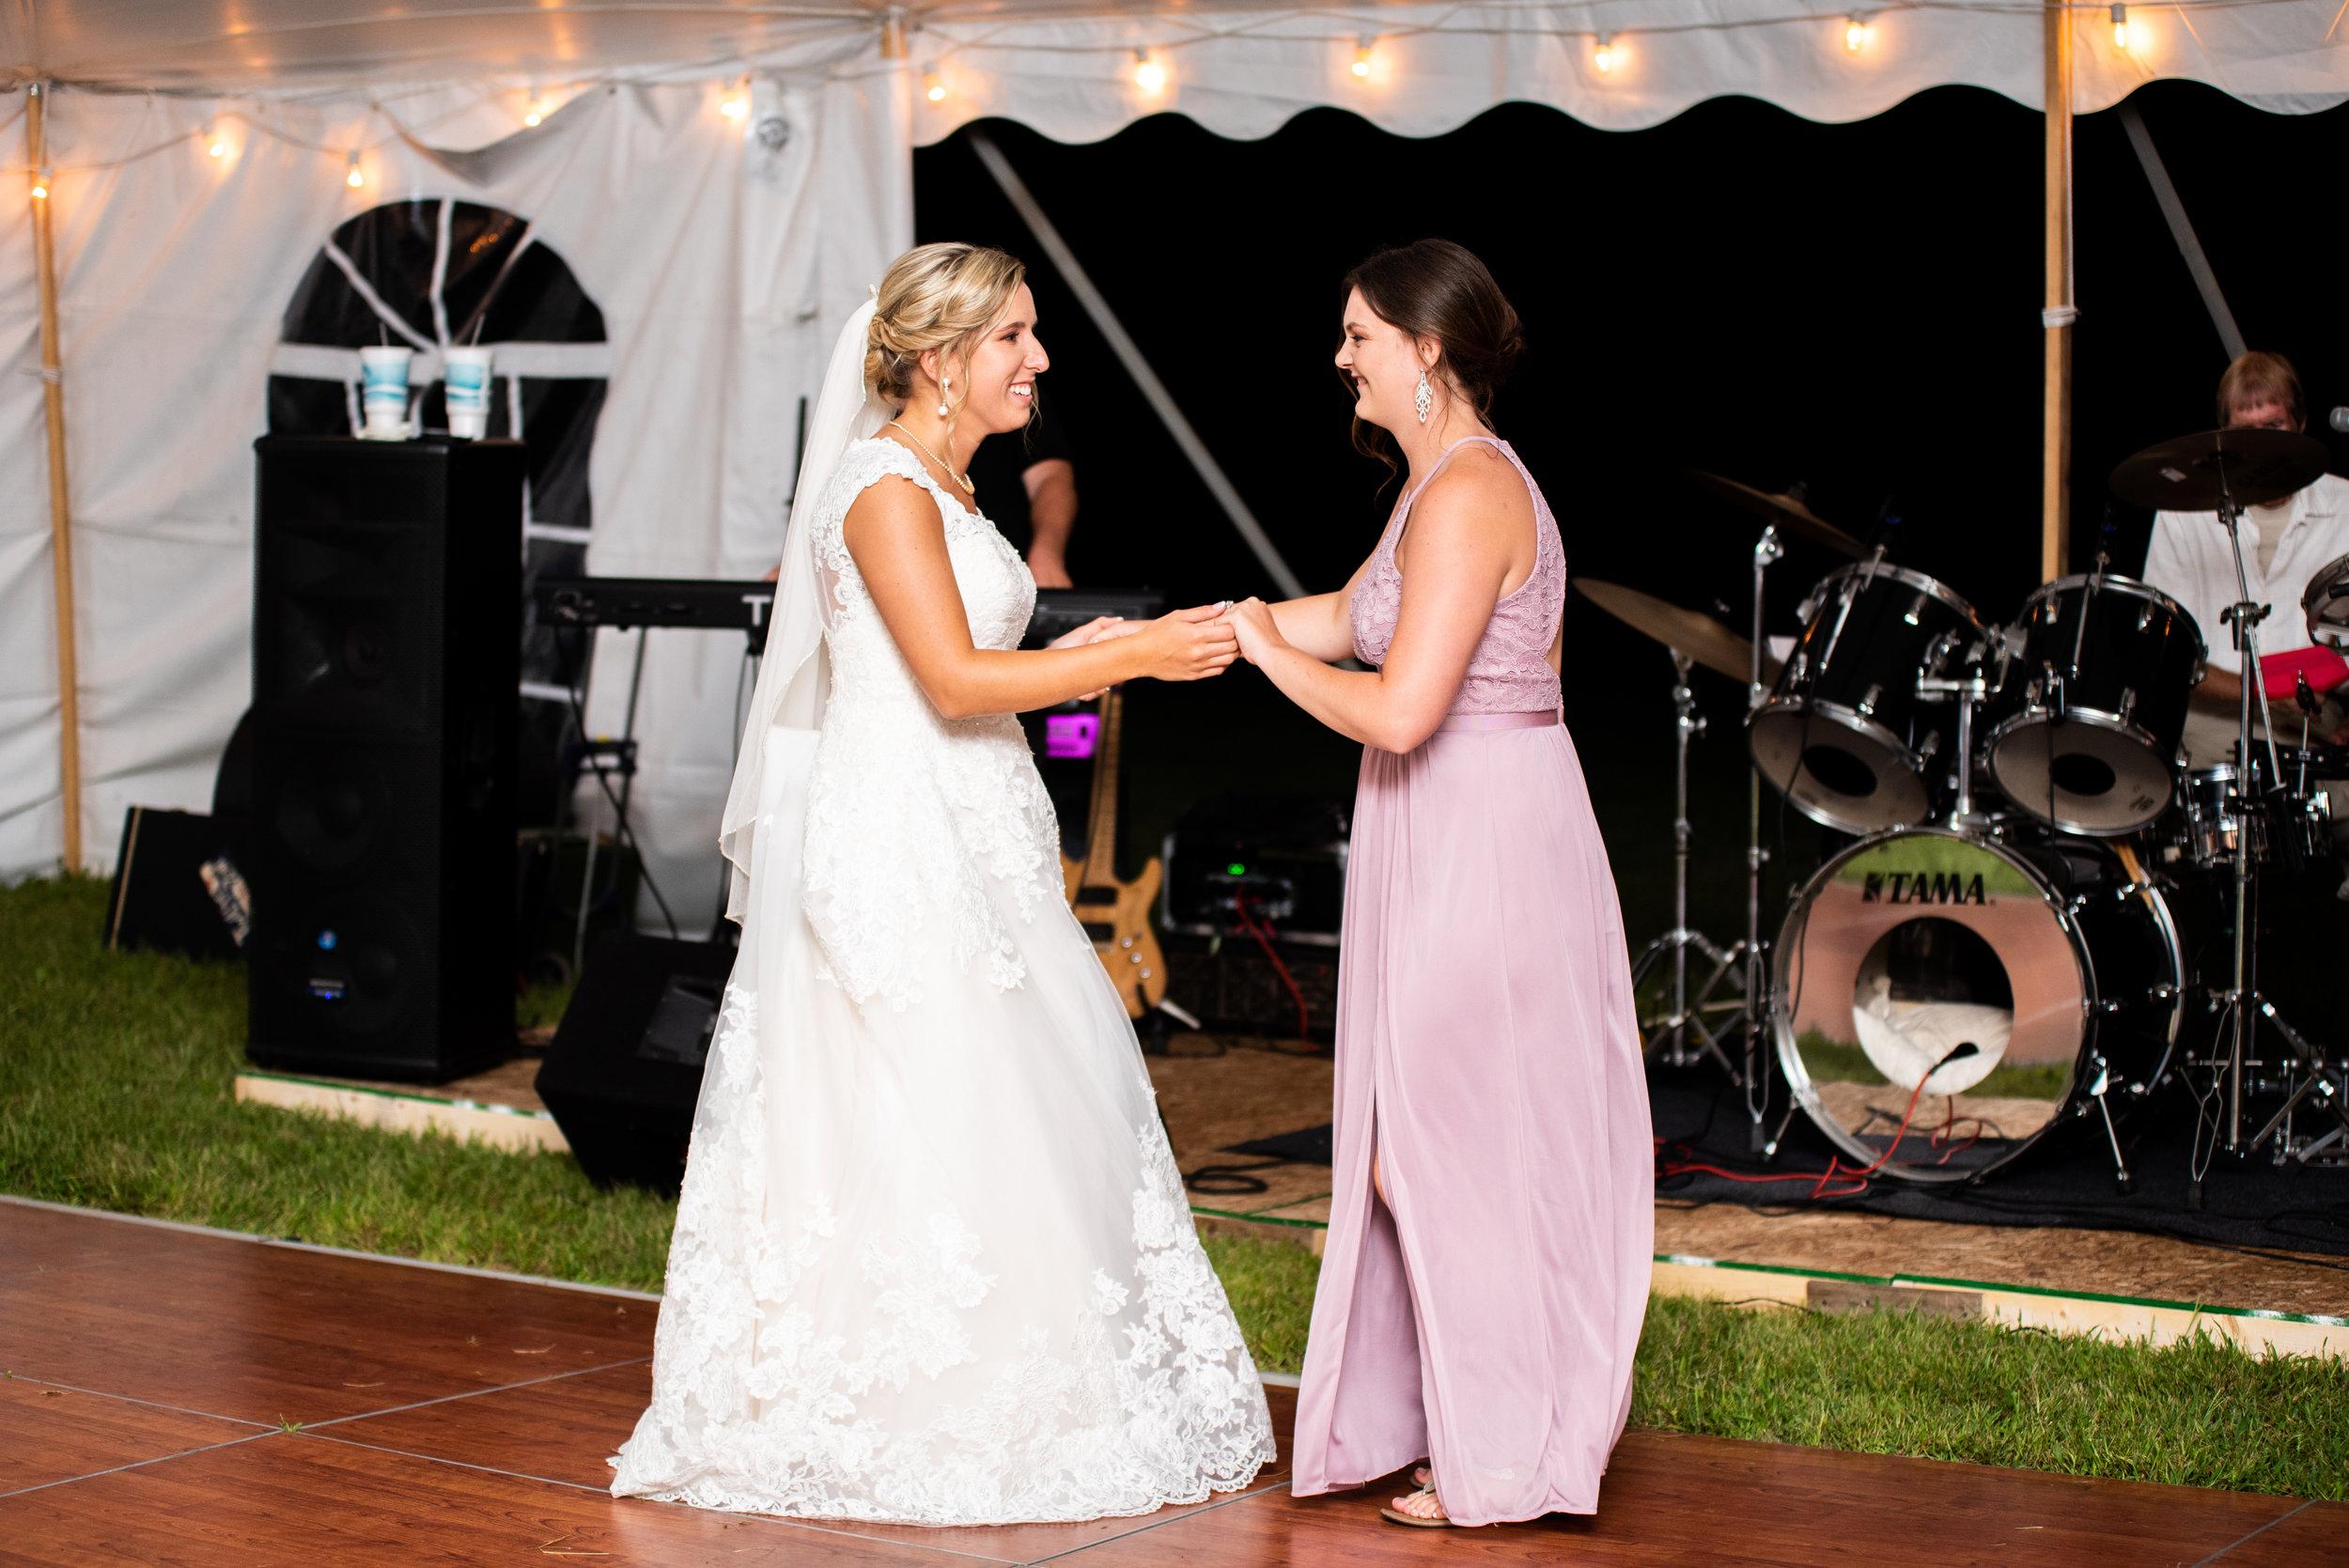 wedding (1 of 1)-221.jpg